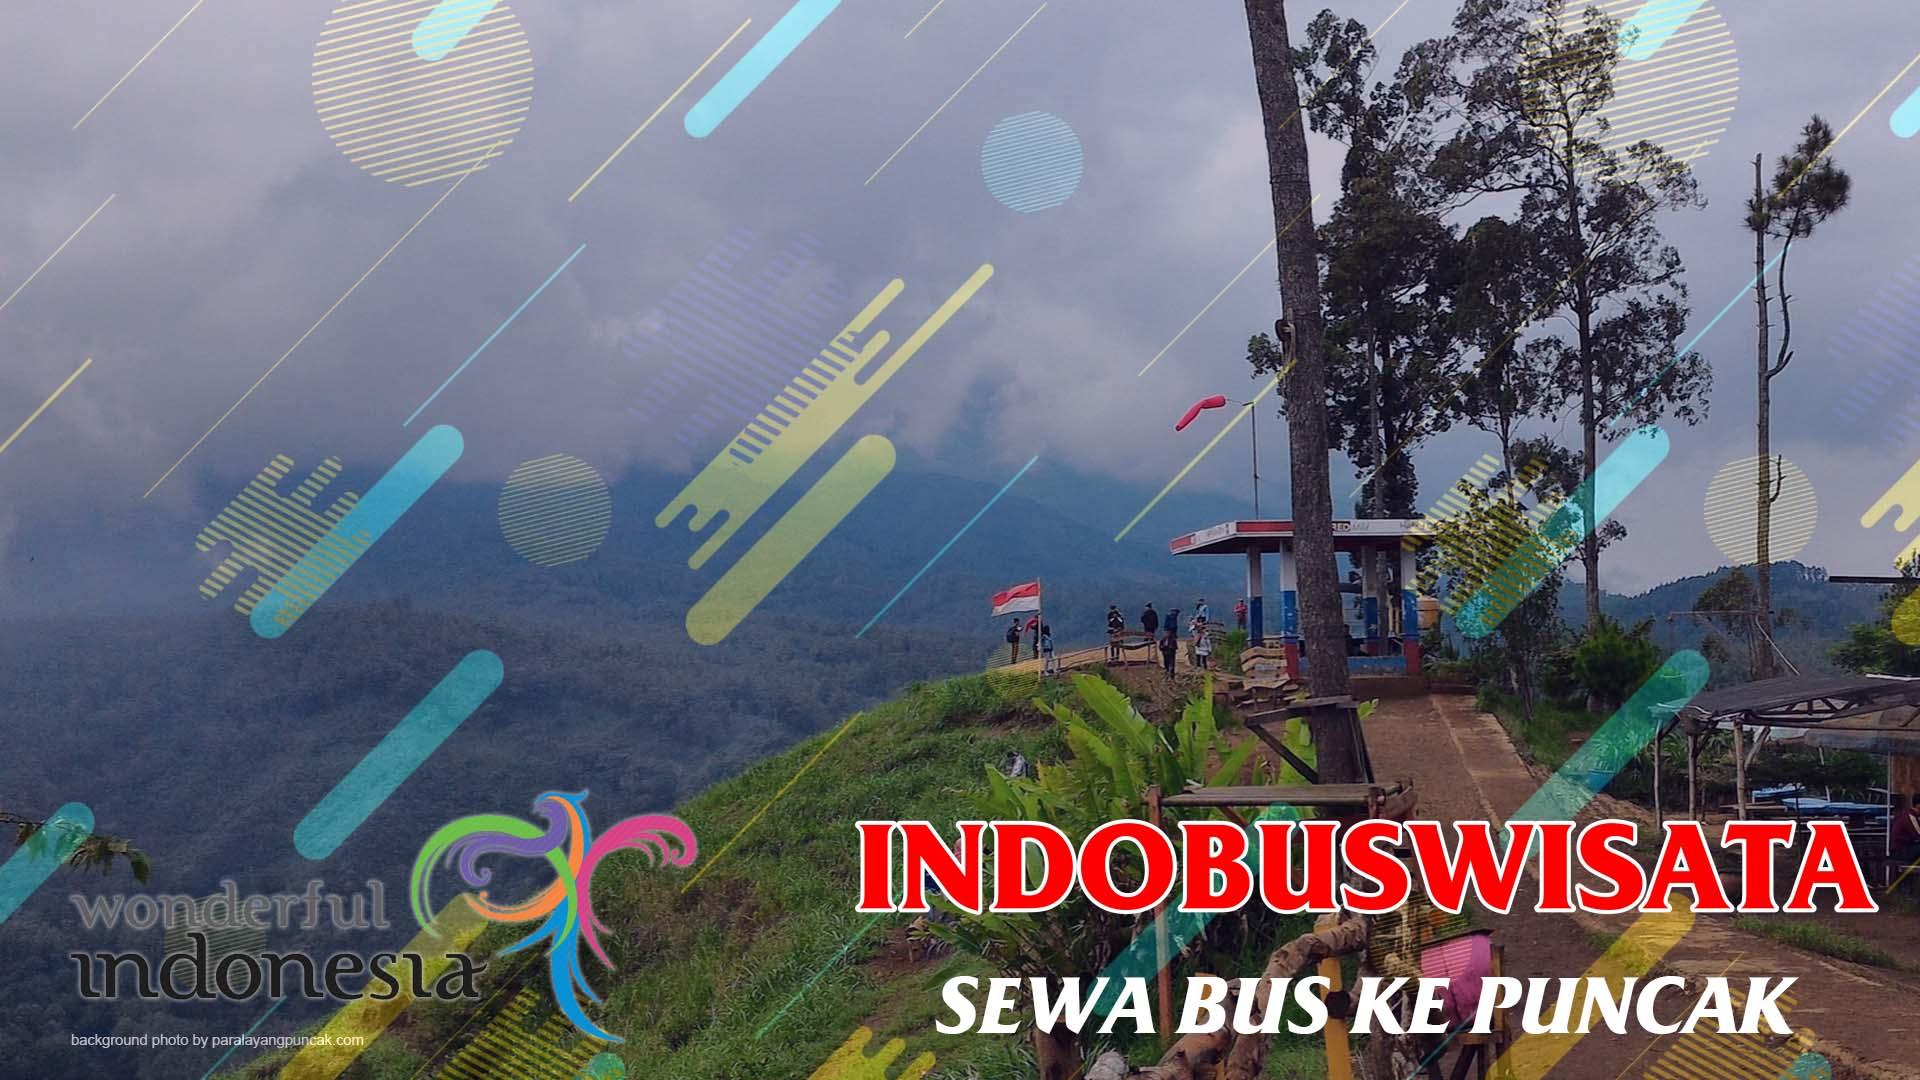 Sewa Bus Ke Puncak - Indobuswisata